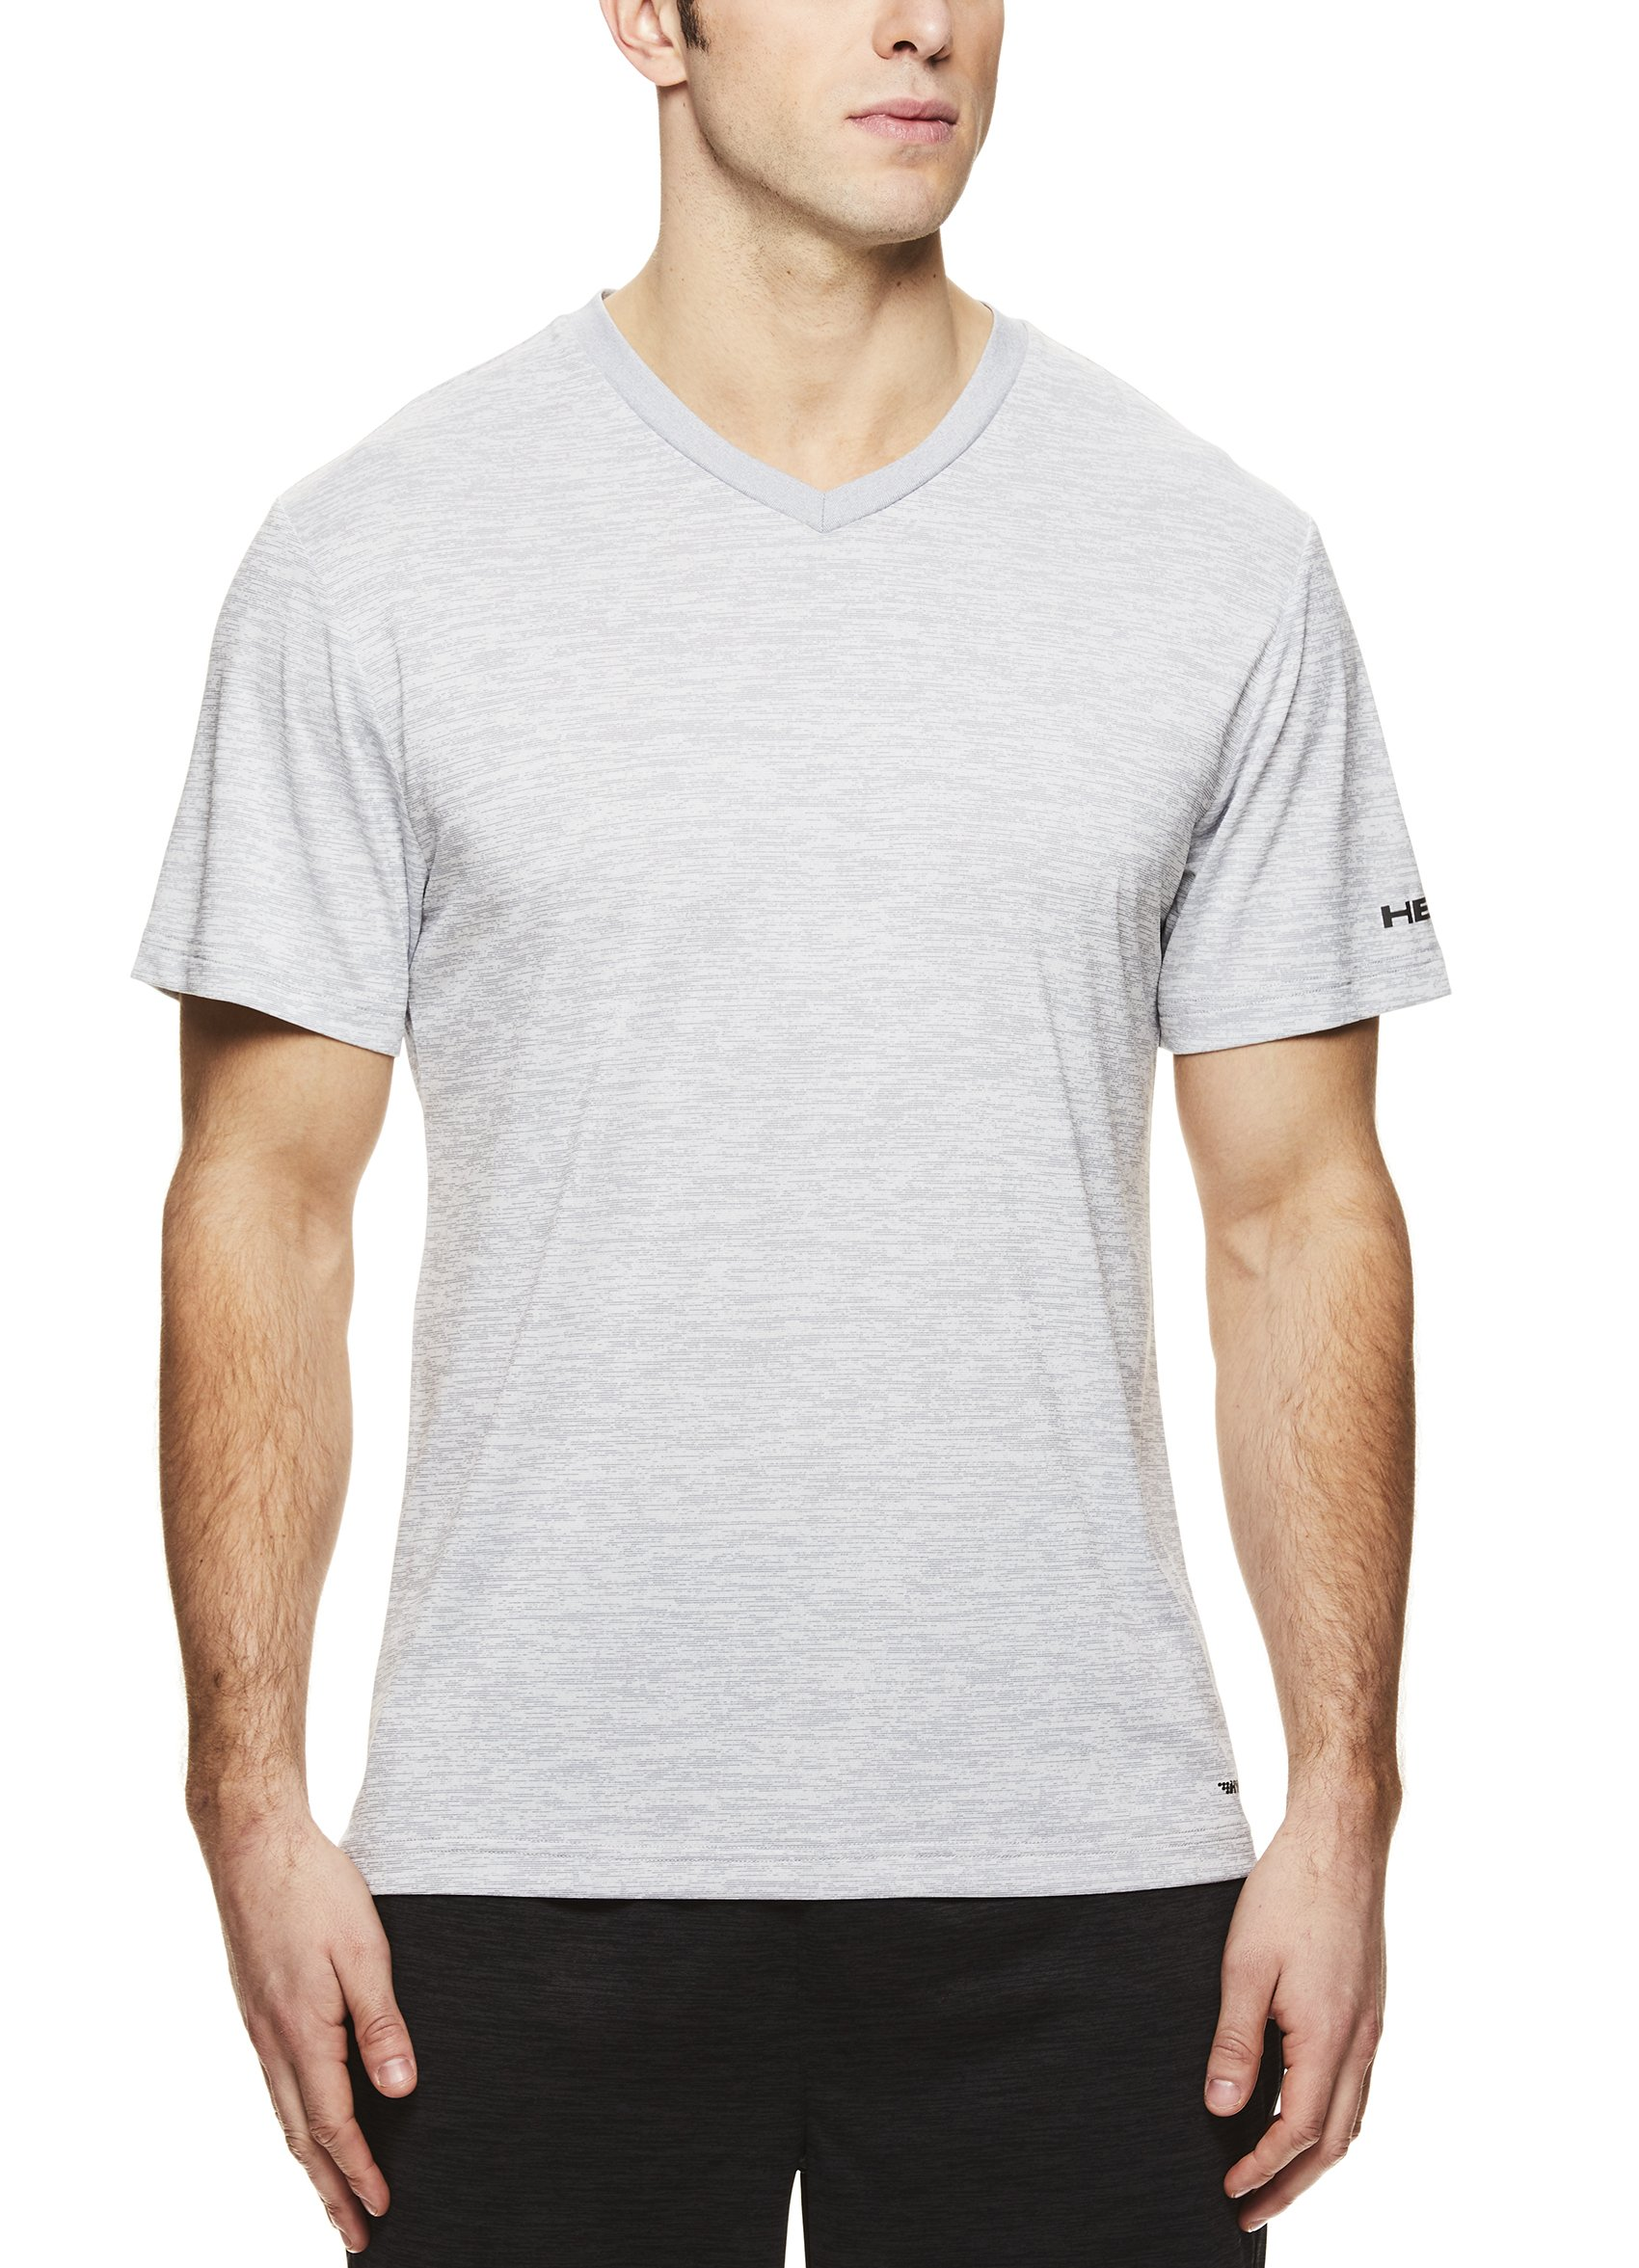 HEAD Men's V Neck Gym Training & Workout T-Shirt - Short Sleeve Activewear Top - Flash Sleet Heather Grey, Small